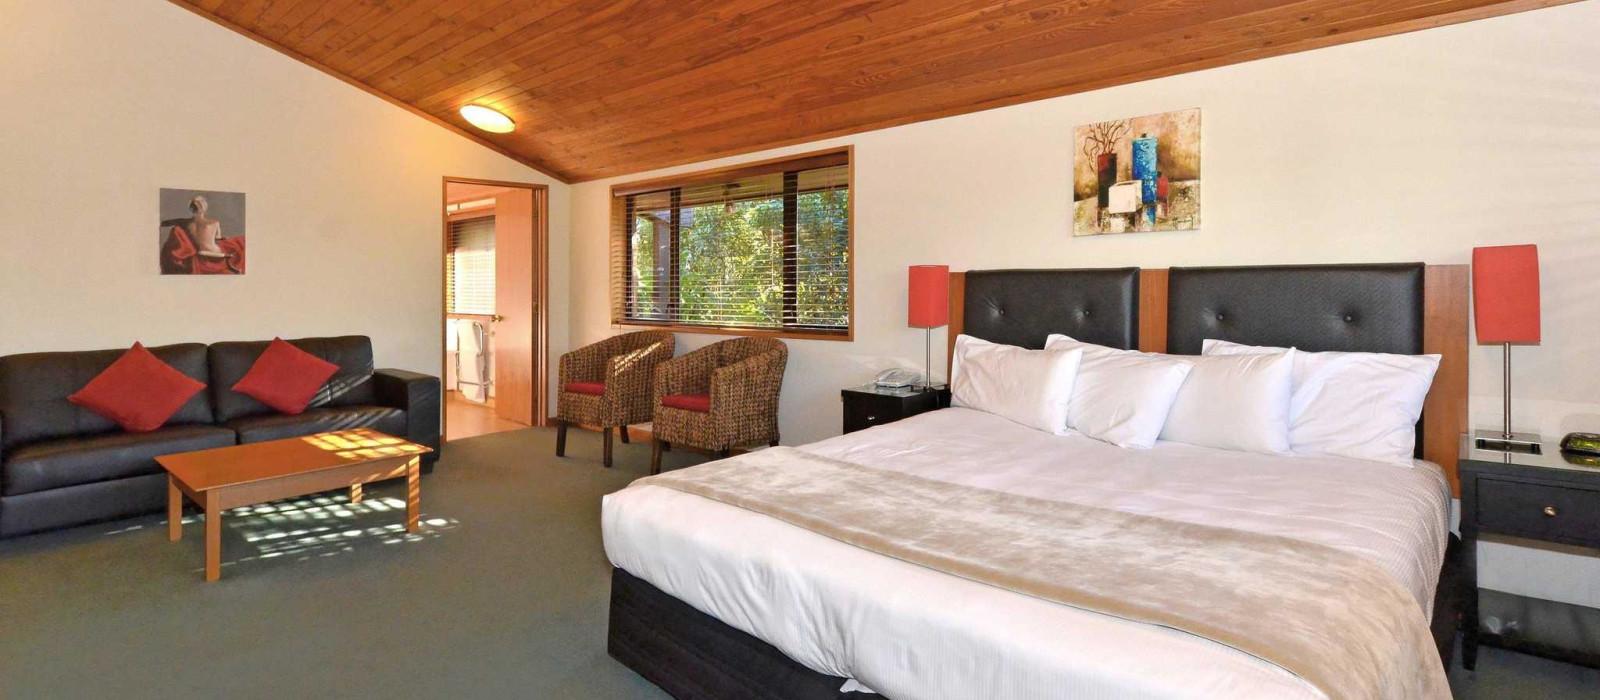 Hotel Quality  Marlborough Blenheim New Zealand